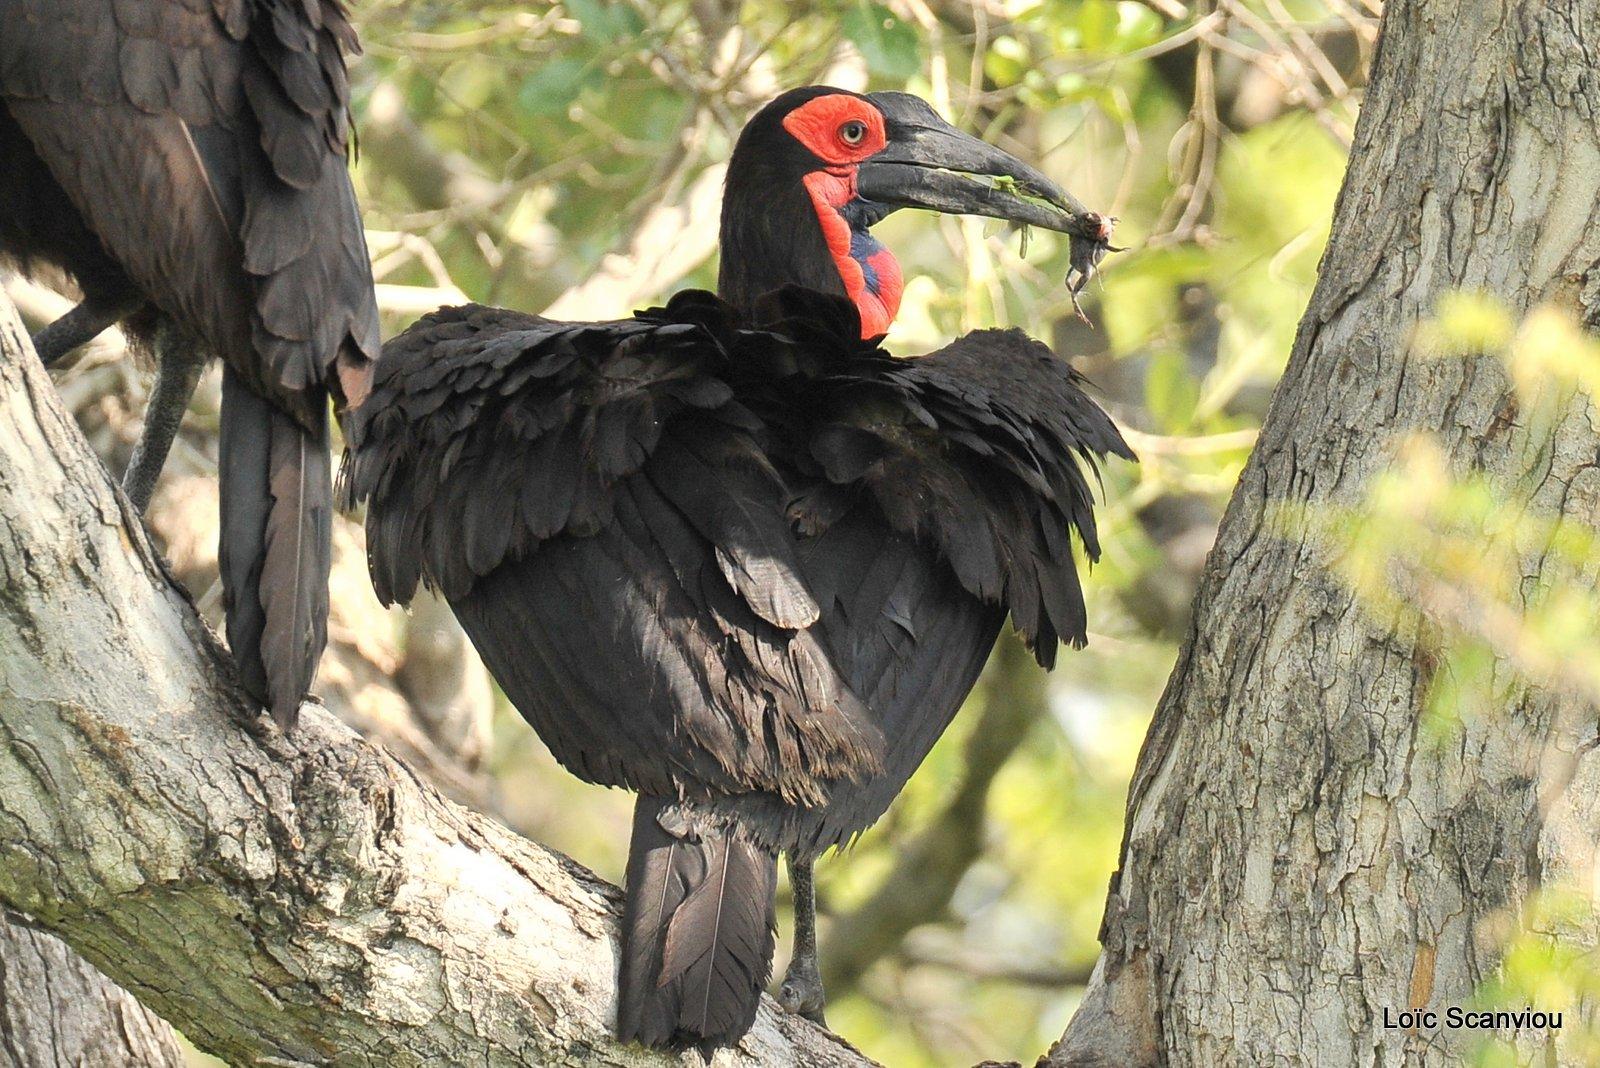 Bucorve du Sud/Southern Ground Hornbill (3)